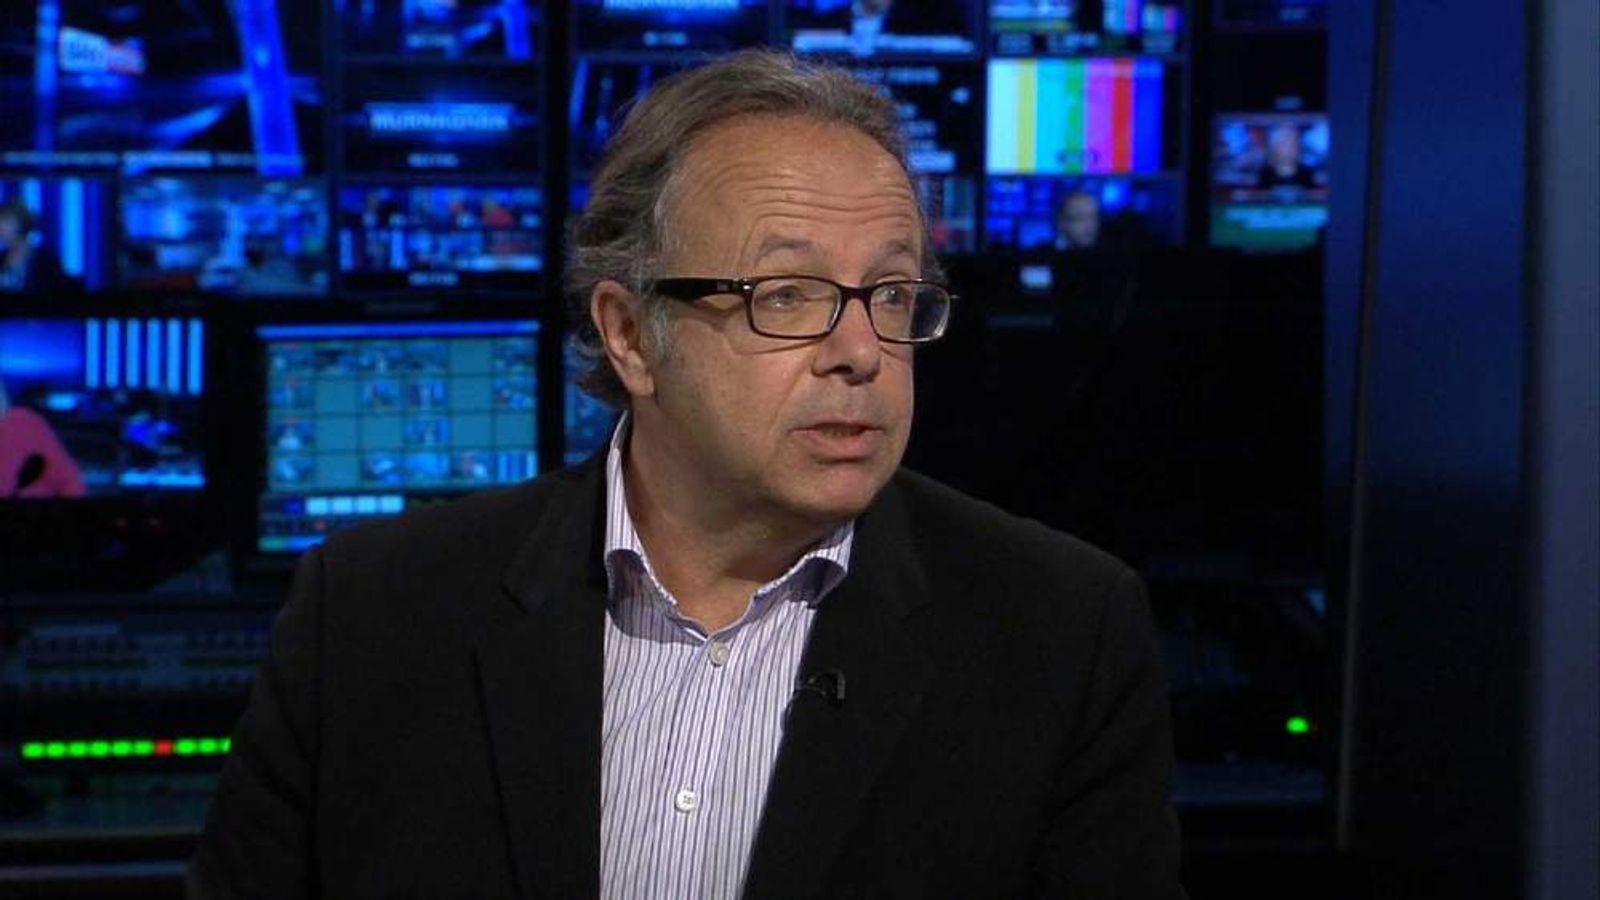 American journalist Michael Goldfarb